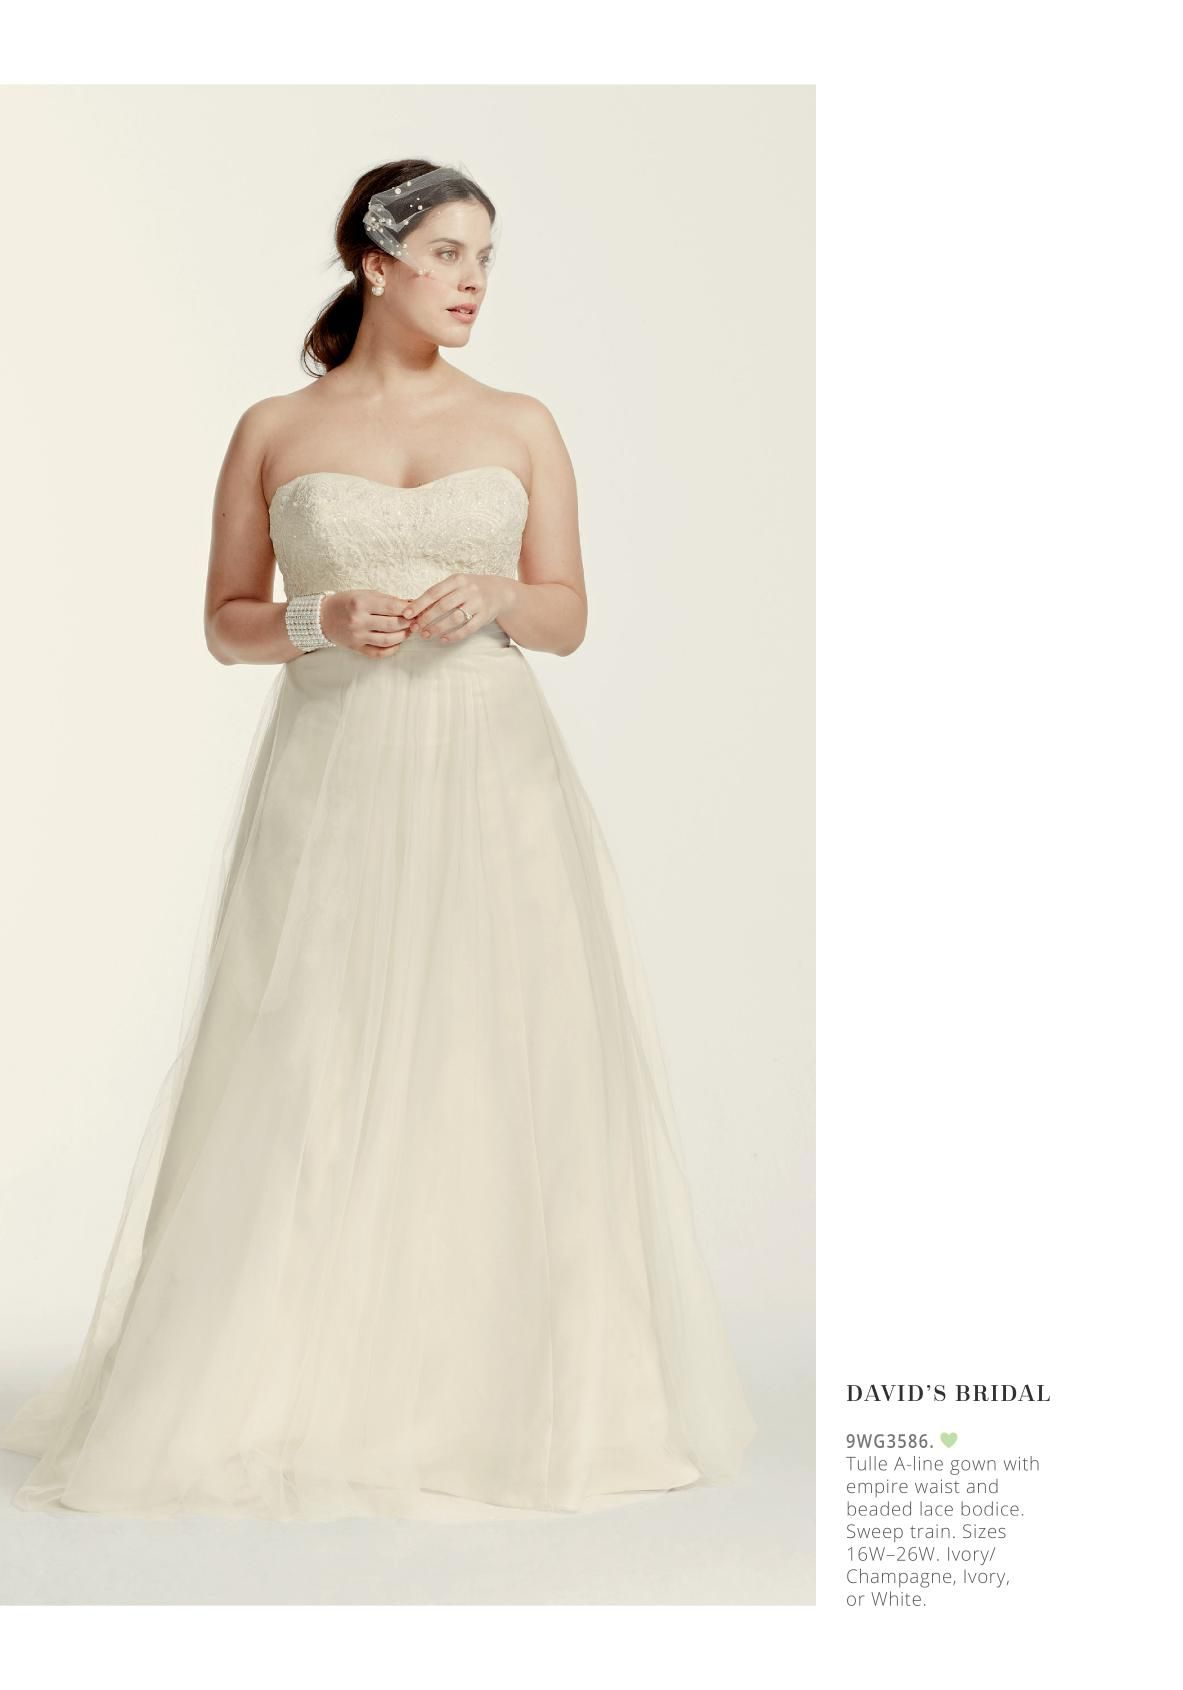 Maternity wedding dresses david's bridal  Davidus Bridal Online Catalog  Wedding Ideas  Pinterest  Weddings